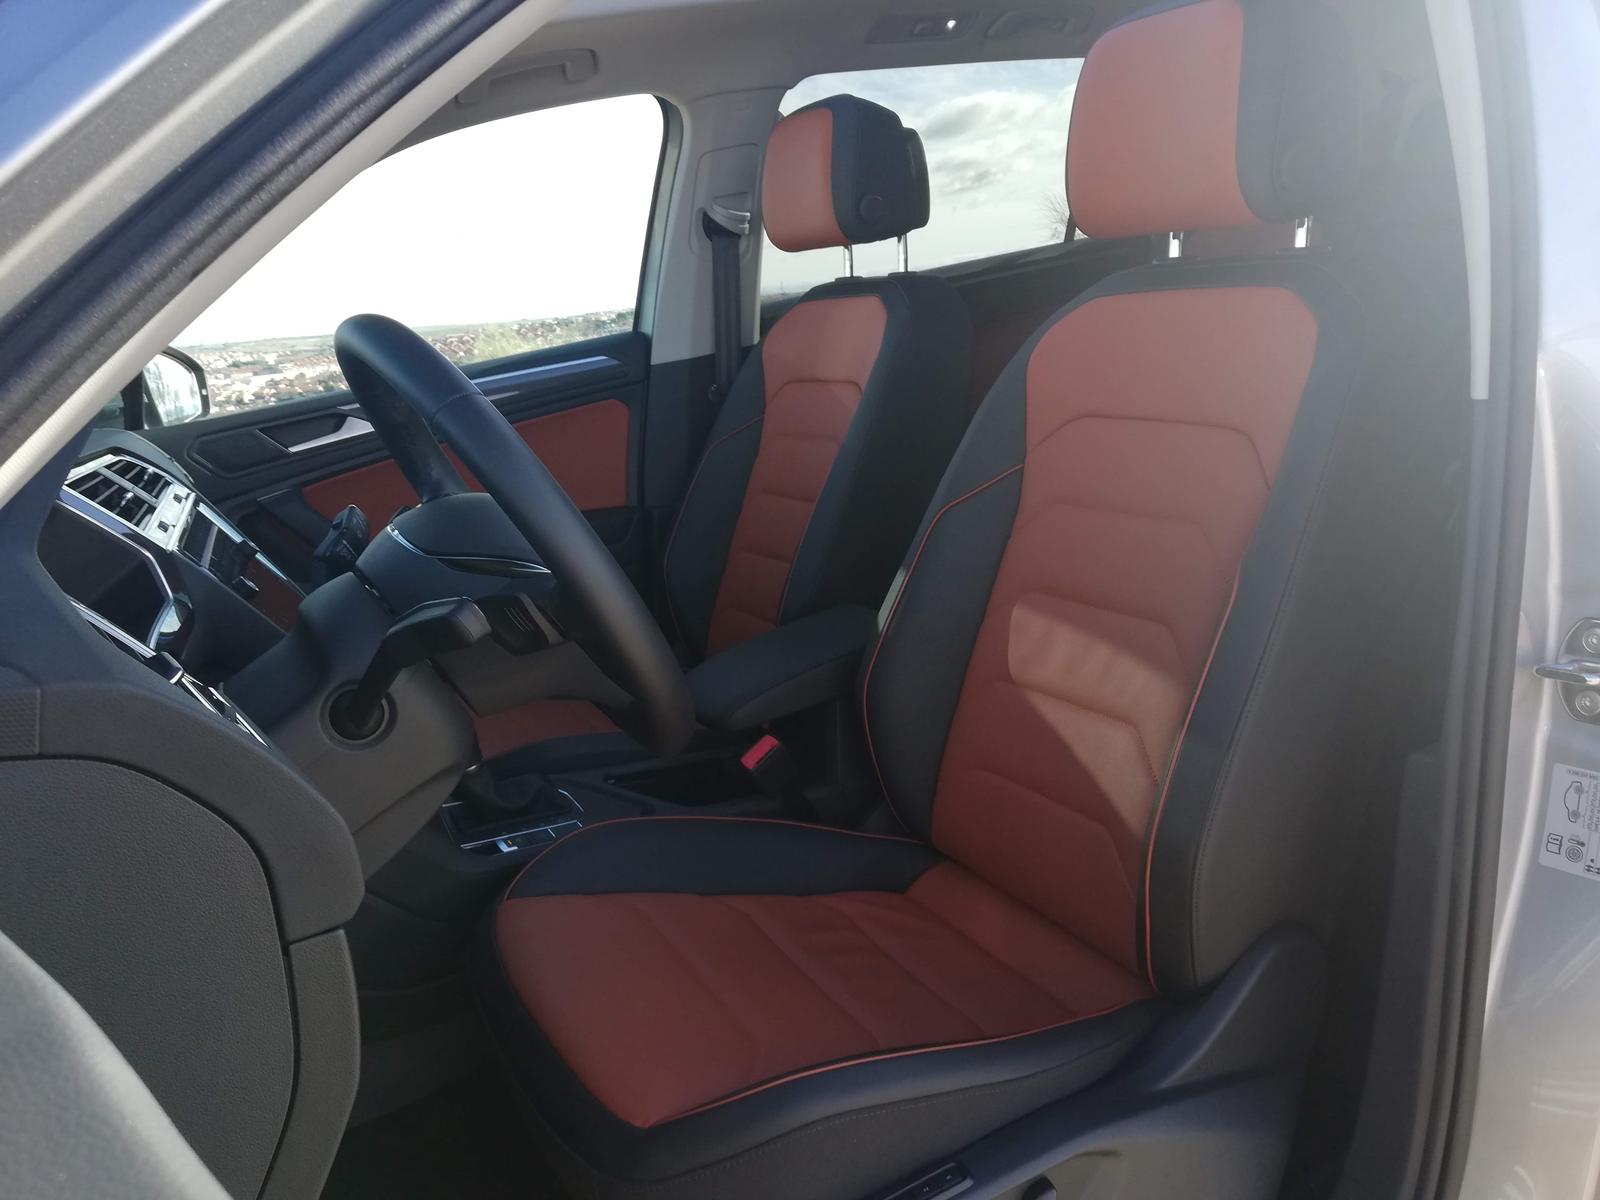 Prueba Volkswagen Tiguan Allspace (18) Copia